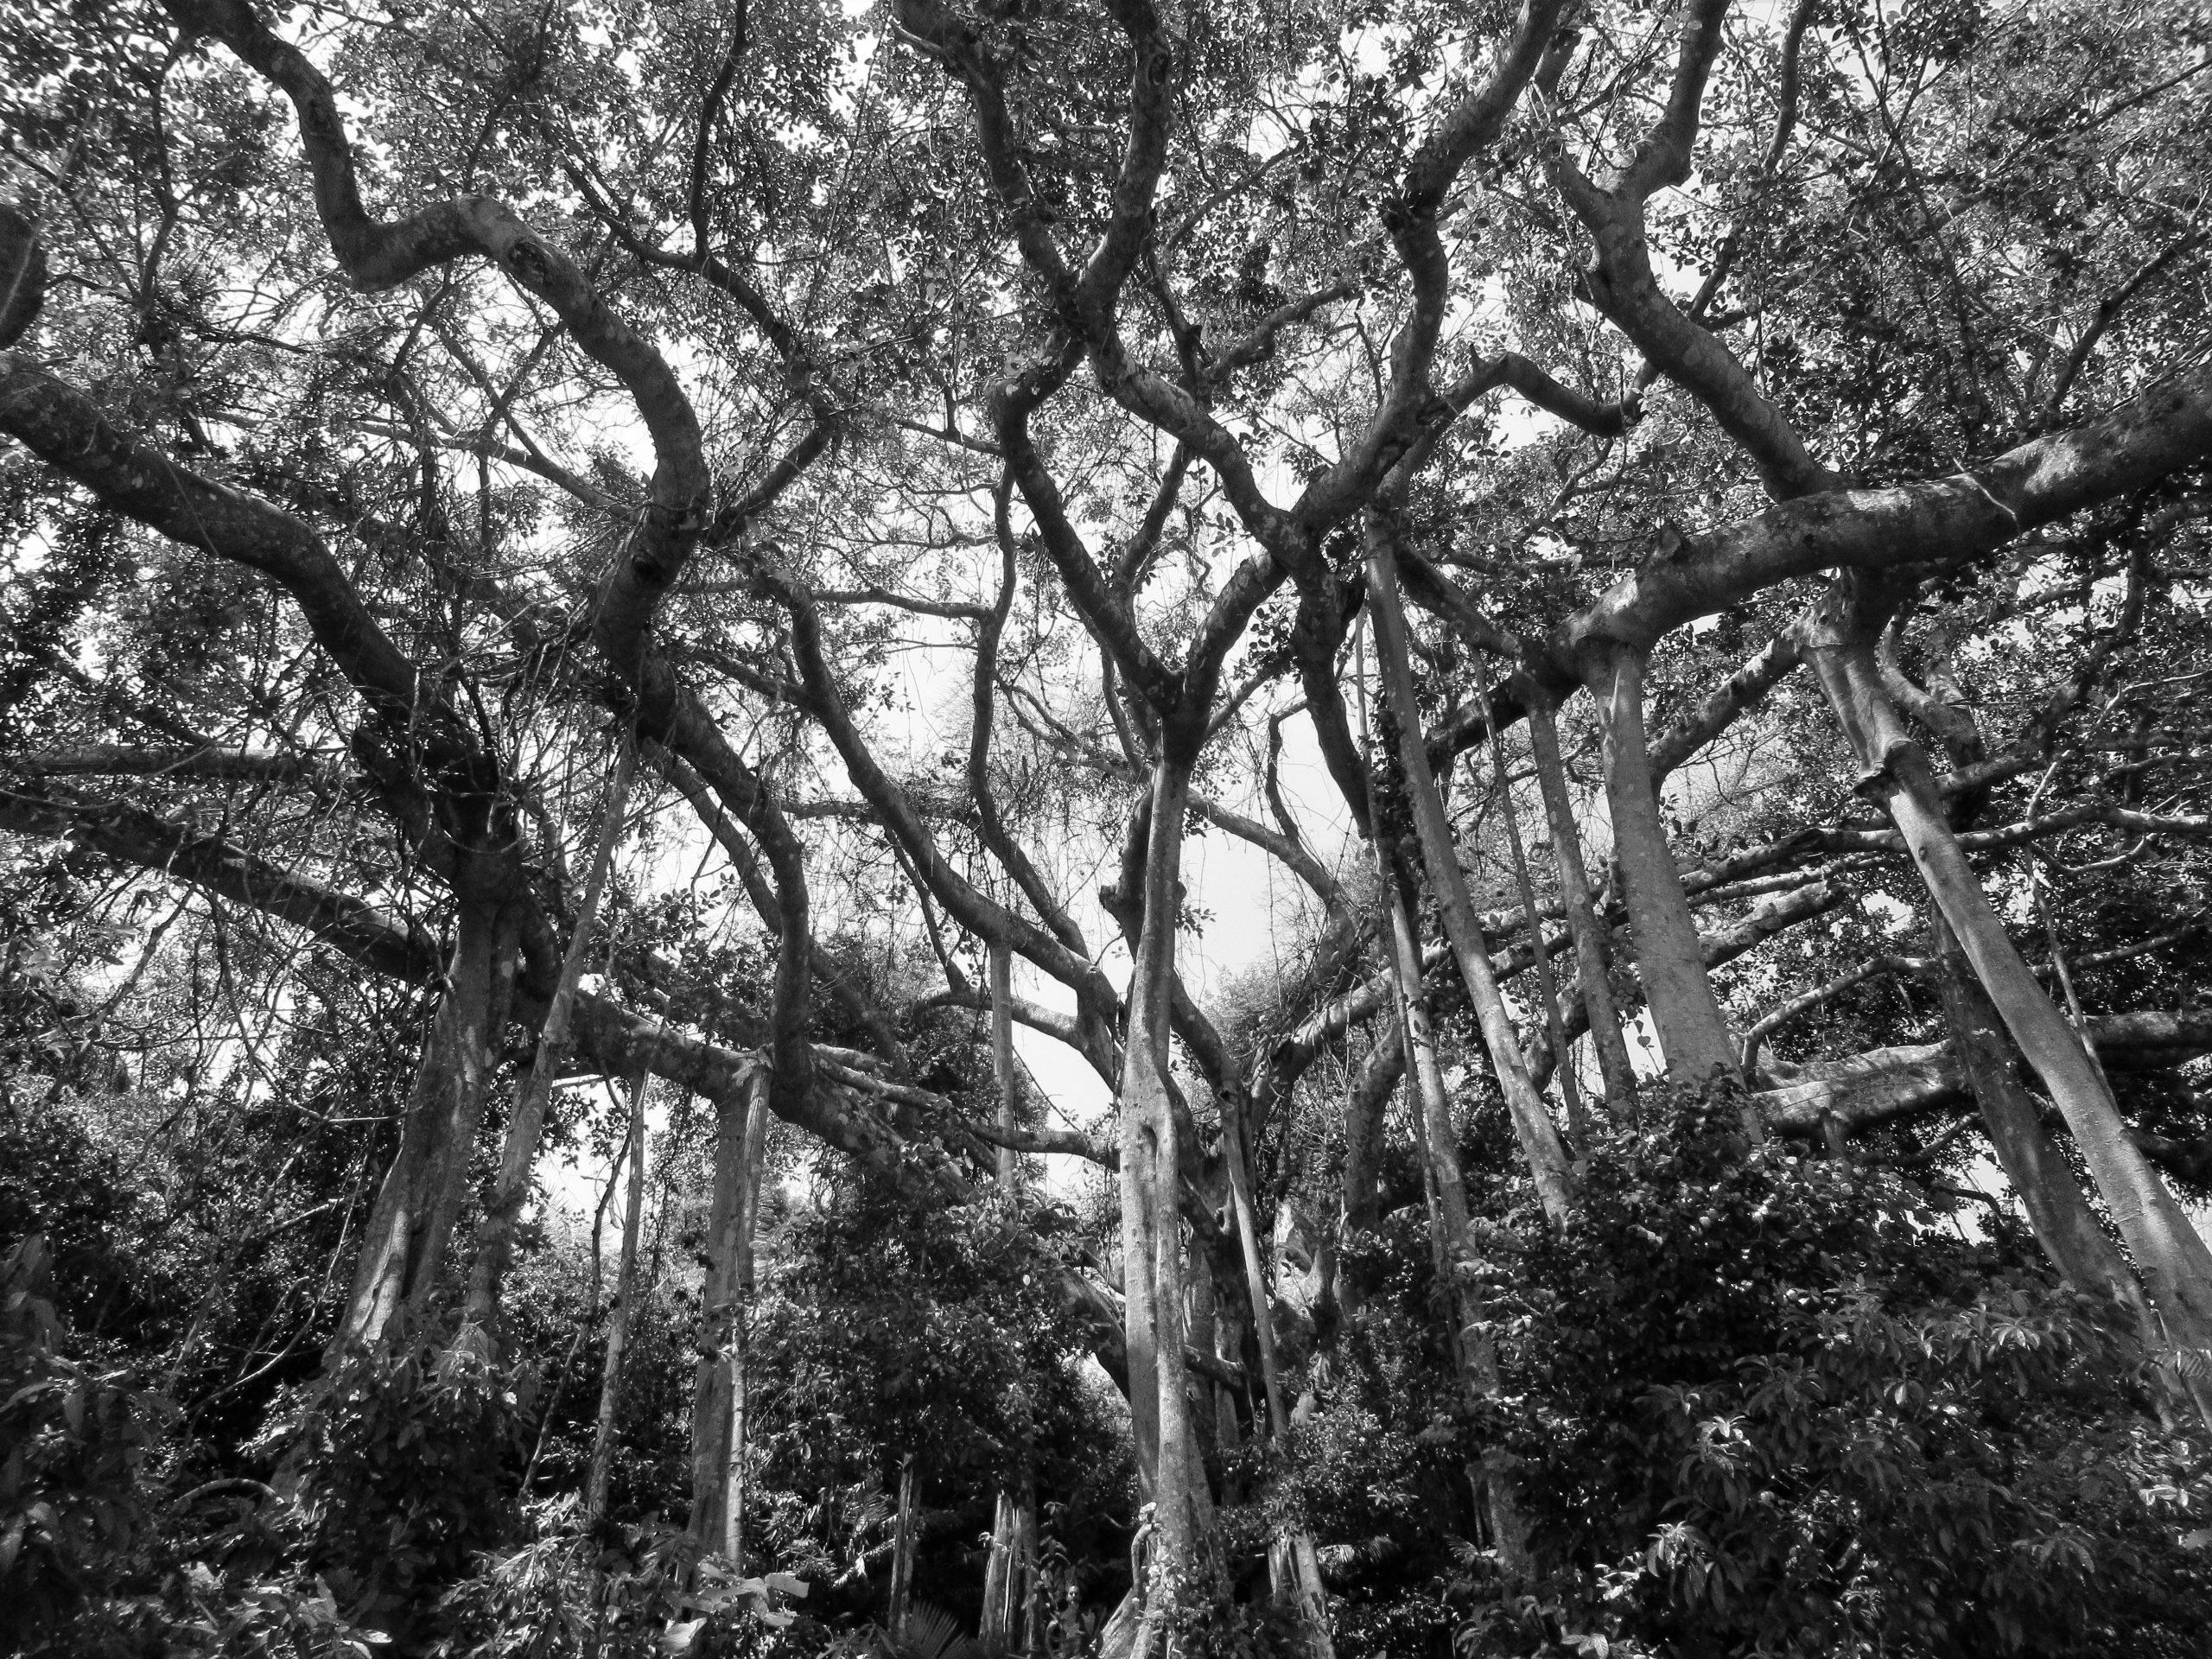 800 year-old banyan tree, Son Tra, Danang, Vietnam